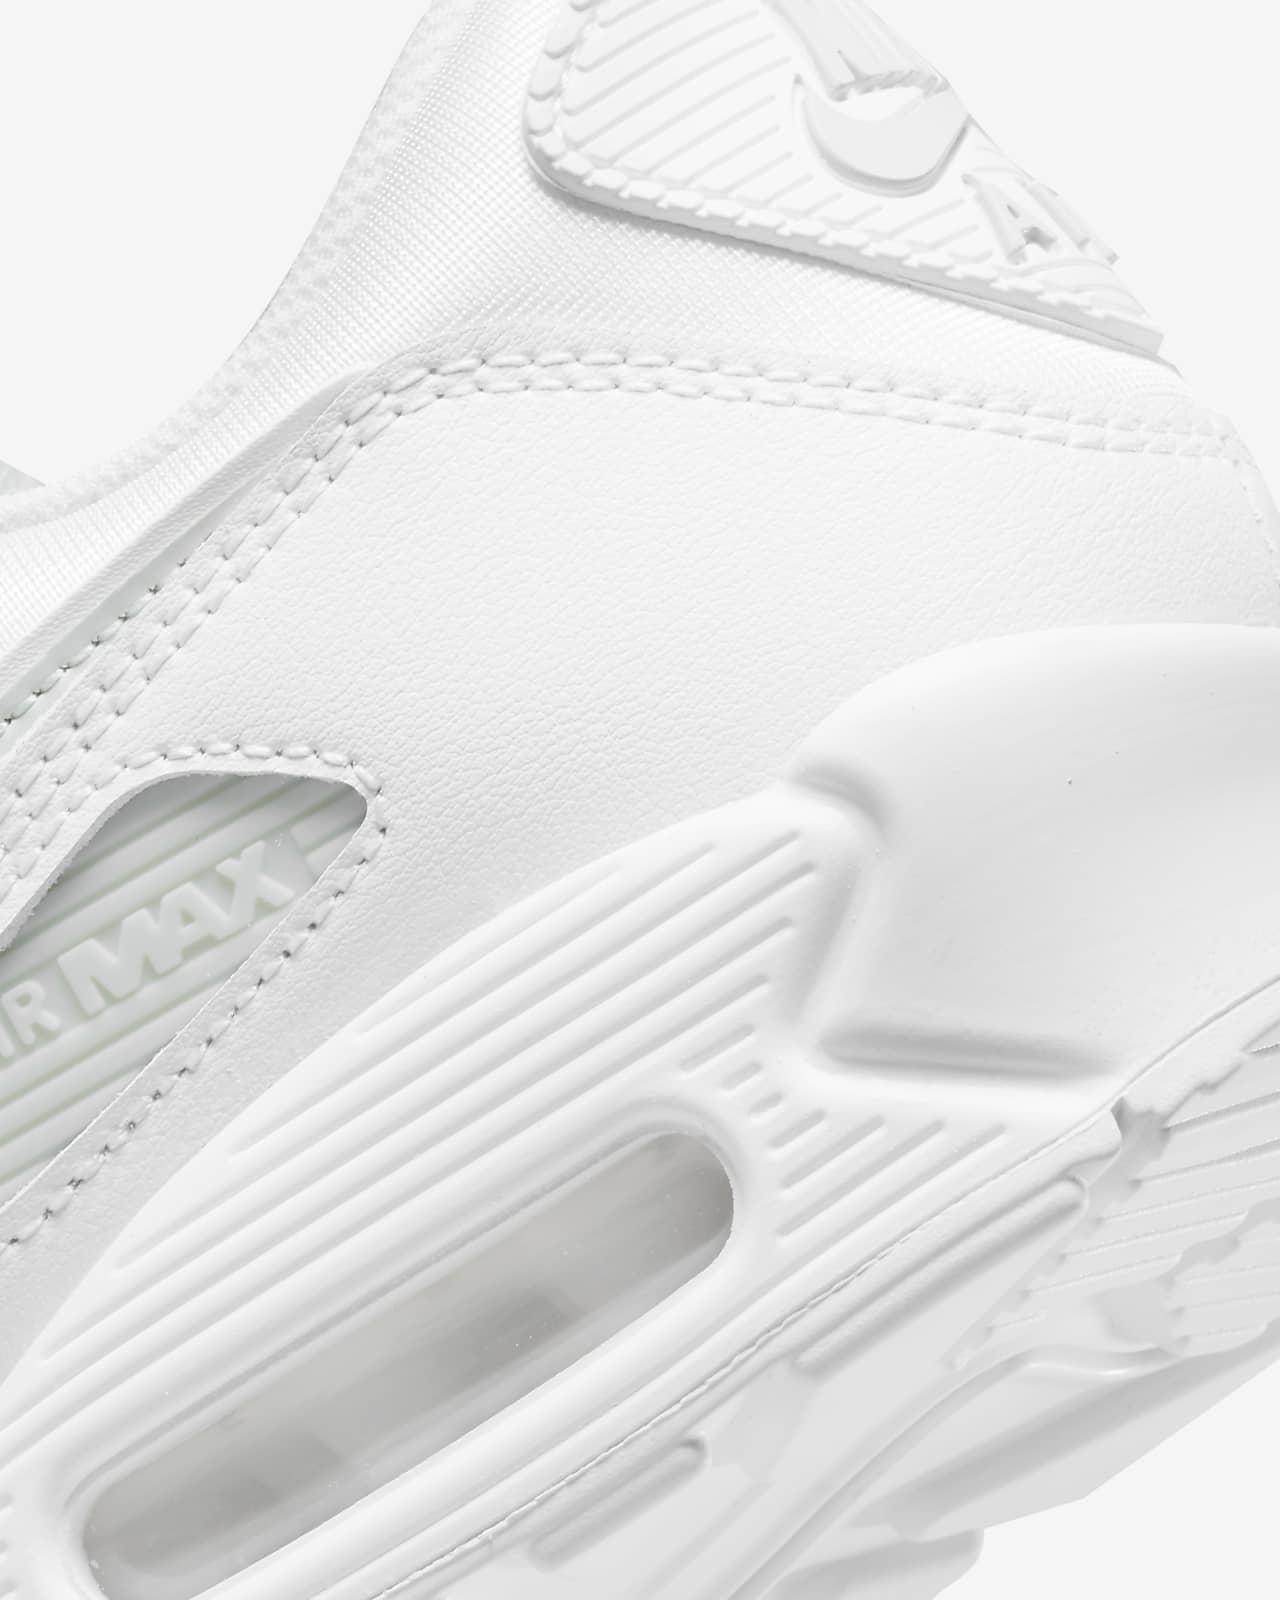 Nike Air Max 90 Women's Shoes. Nike LU